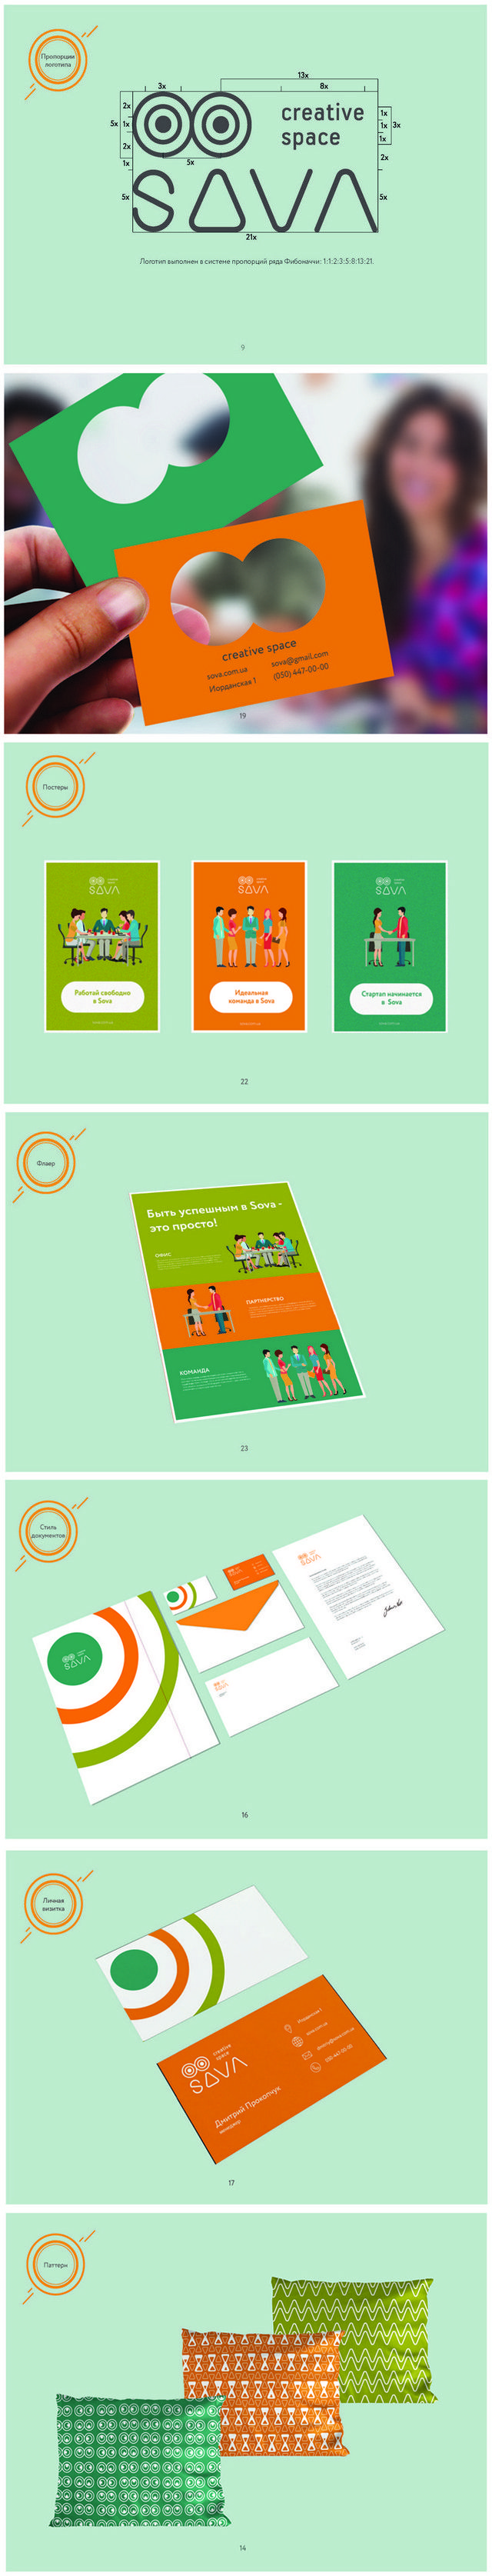 "Coworking logo and branding by Katerina Melnichenko, ""Garphic design"" course student in European Design School, Kiev, Ukraine. Разработка логотипа и фирменного стиля для коворкинга, автор - Катерина Мельниченко, выпускница курса ""Графический дизайн - Интенсив"" в Европейской Школе Дизайна. #graphicdesign #coworking #logo #branding"